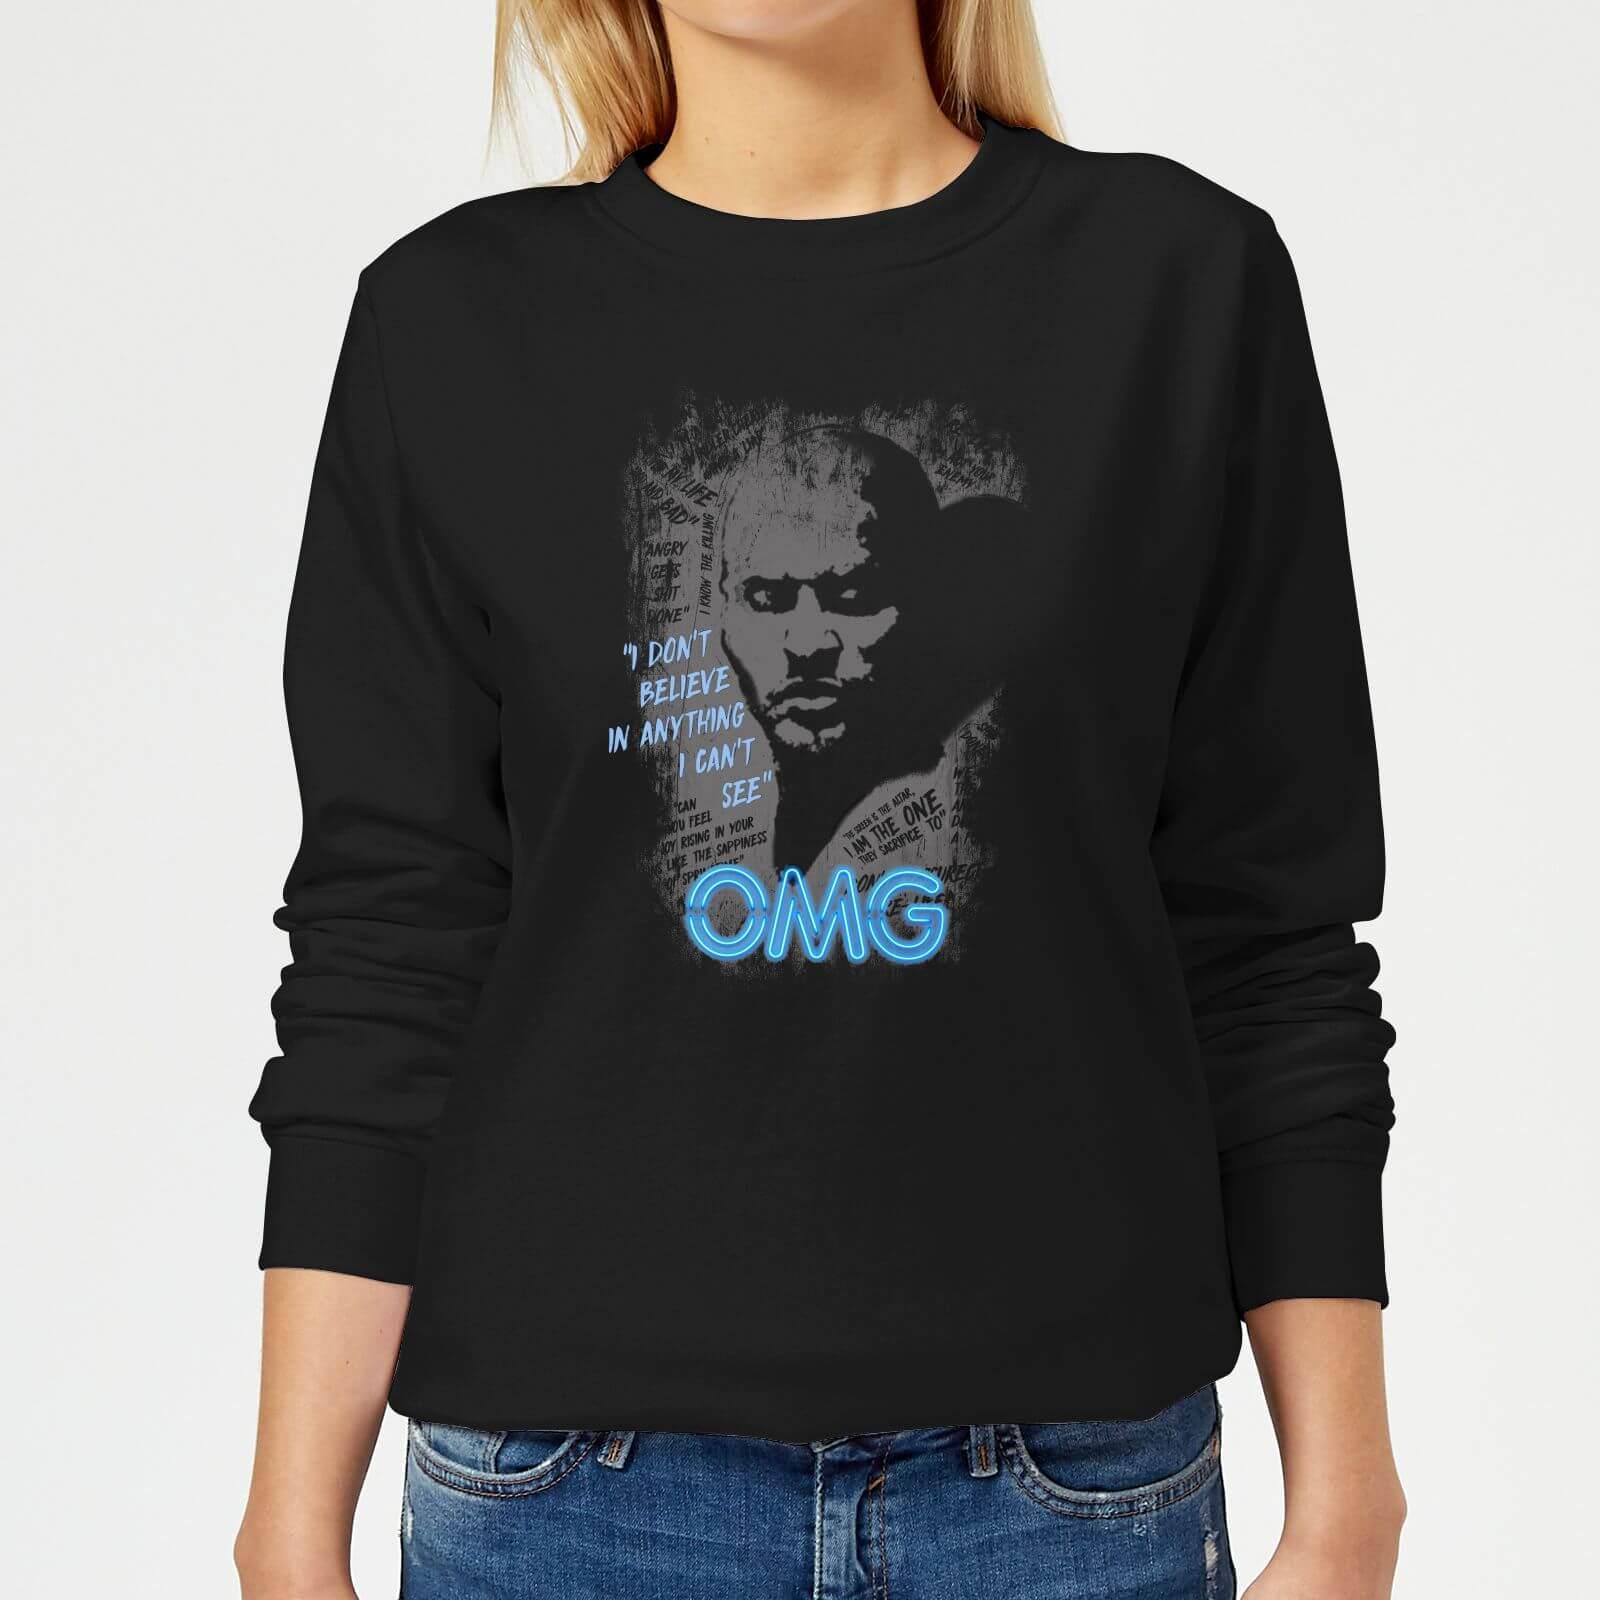 American Gods Shadow OMG Women's Sweatshirt - Black - XL - Black-female